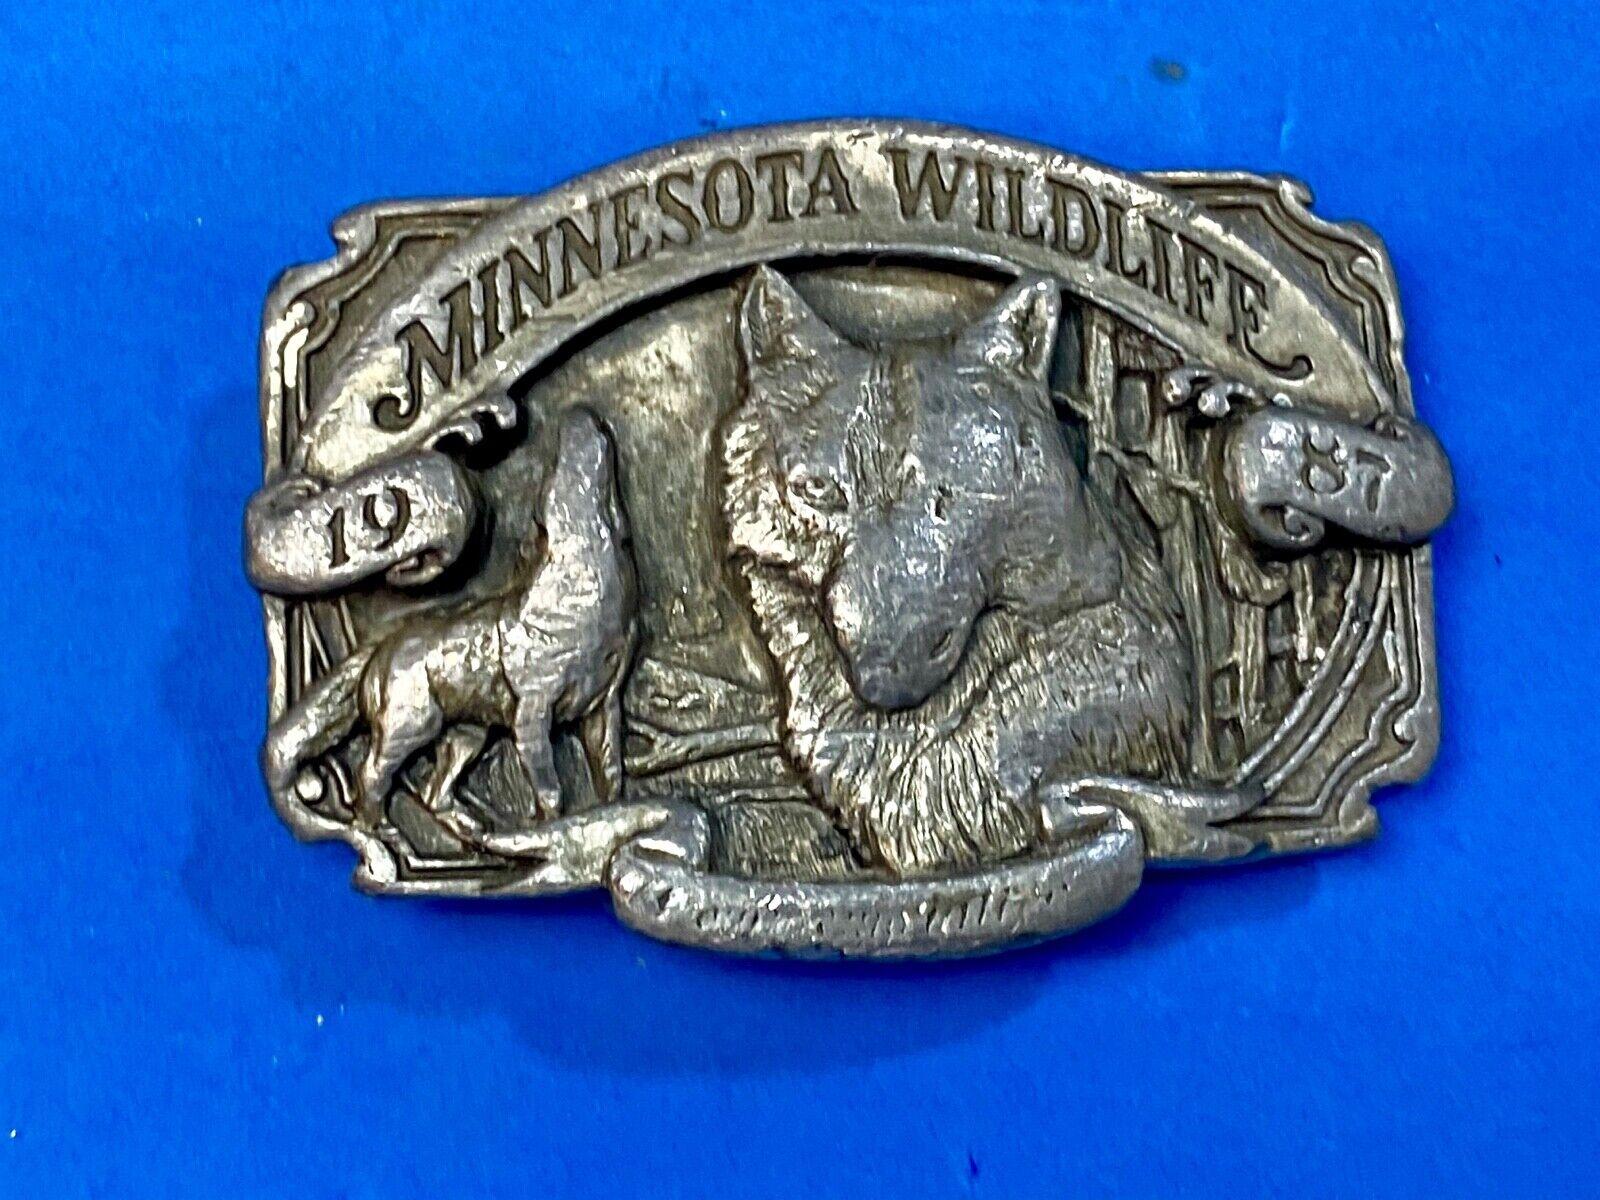 Vintage 1987 Commemorative Timber Wolf State of MN Minesota Wildlife series